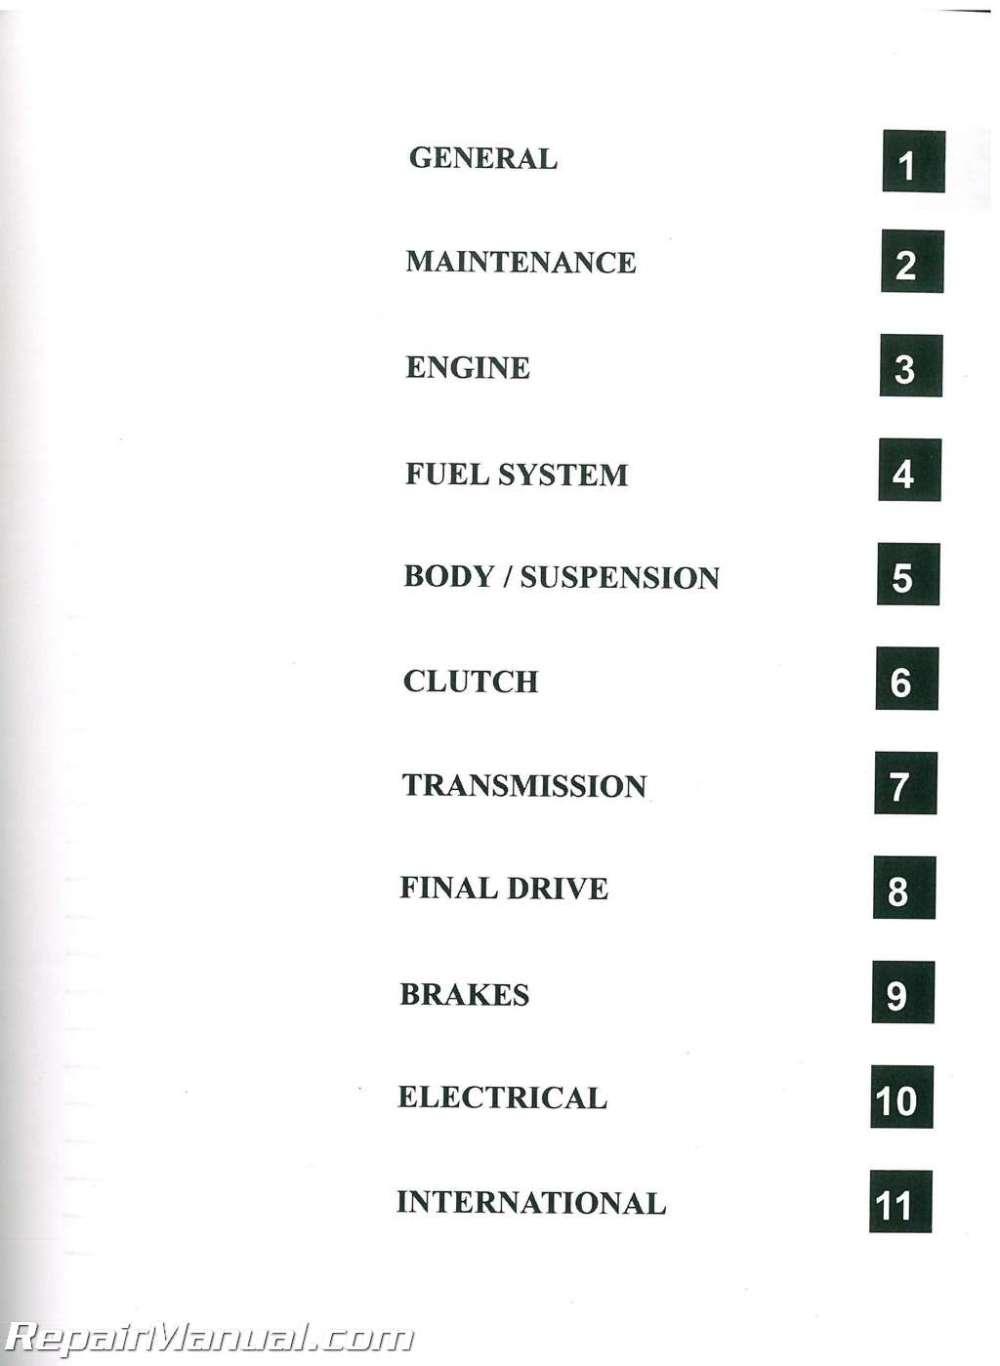 medium resolution of 2008 polaris sportsman 500 efi x2 touring h o atv service manual rh repairmanual com 2005 polaris 2007 polaris sportsman 500 adc wiring diagram